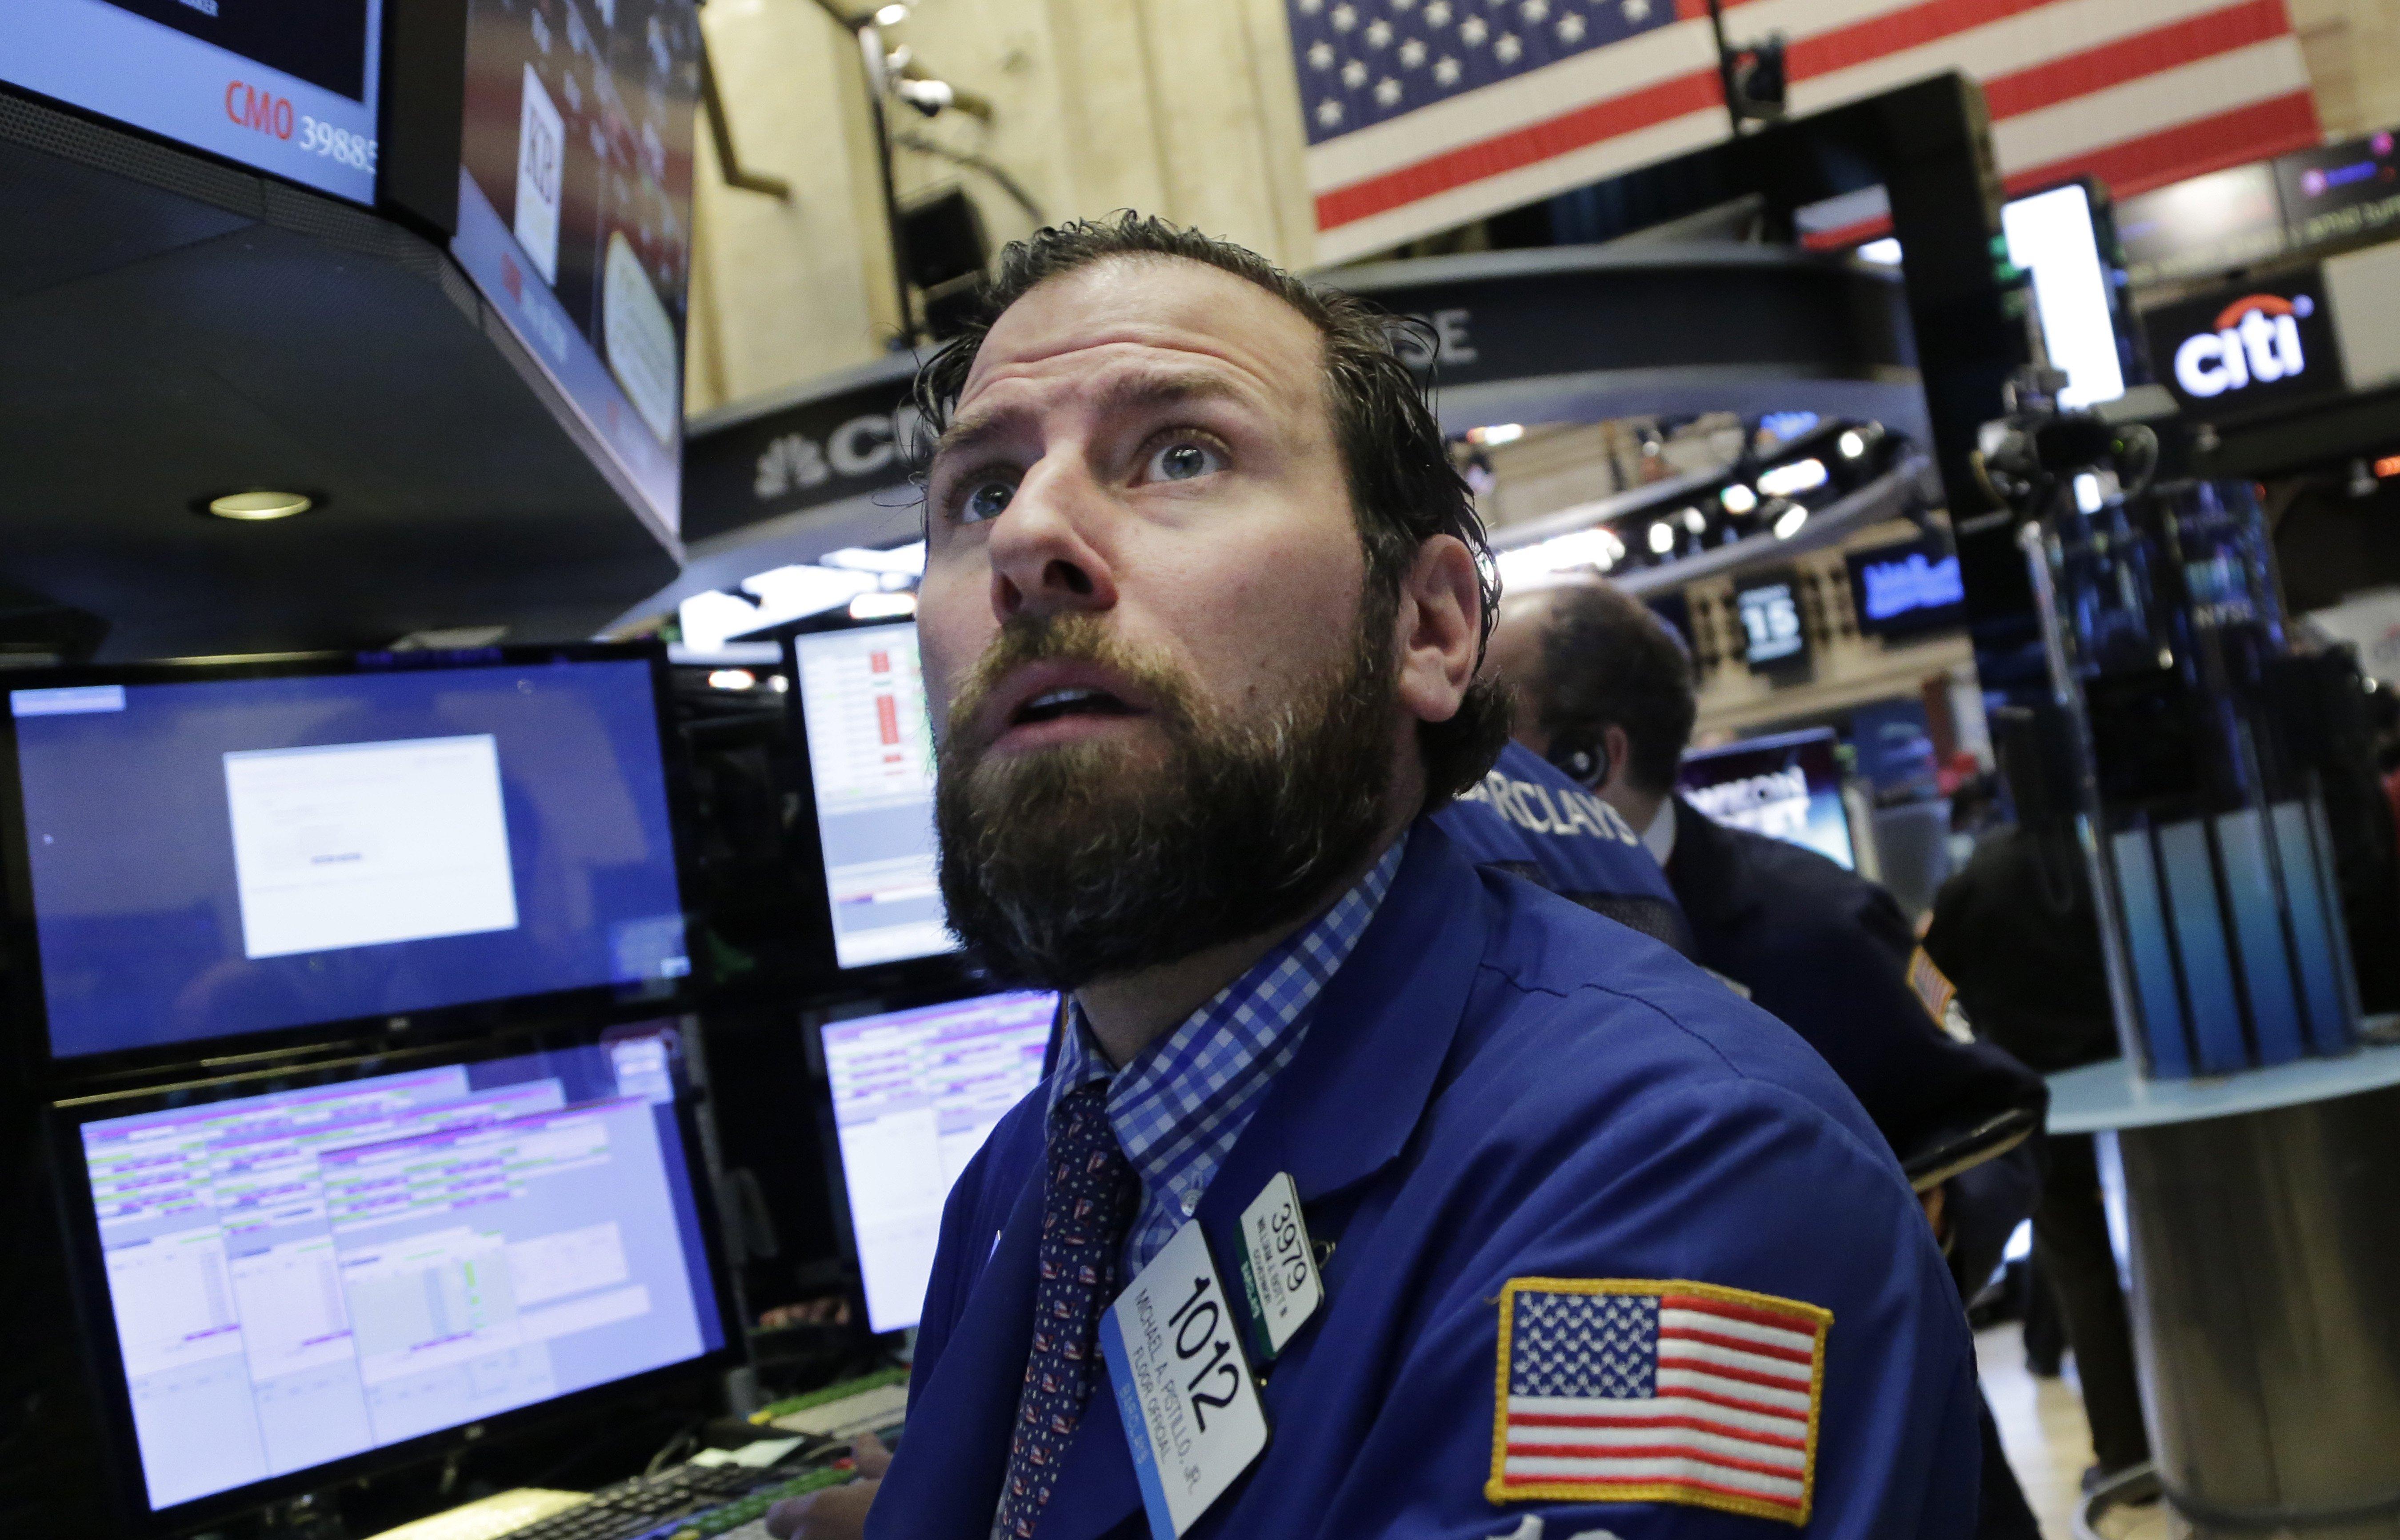 Michael Pistillo Jr. follows stock prices at the New York Stock Exchange on Jan. 15, 2016.